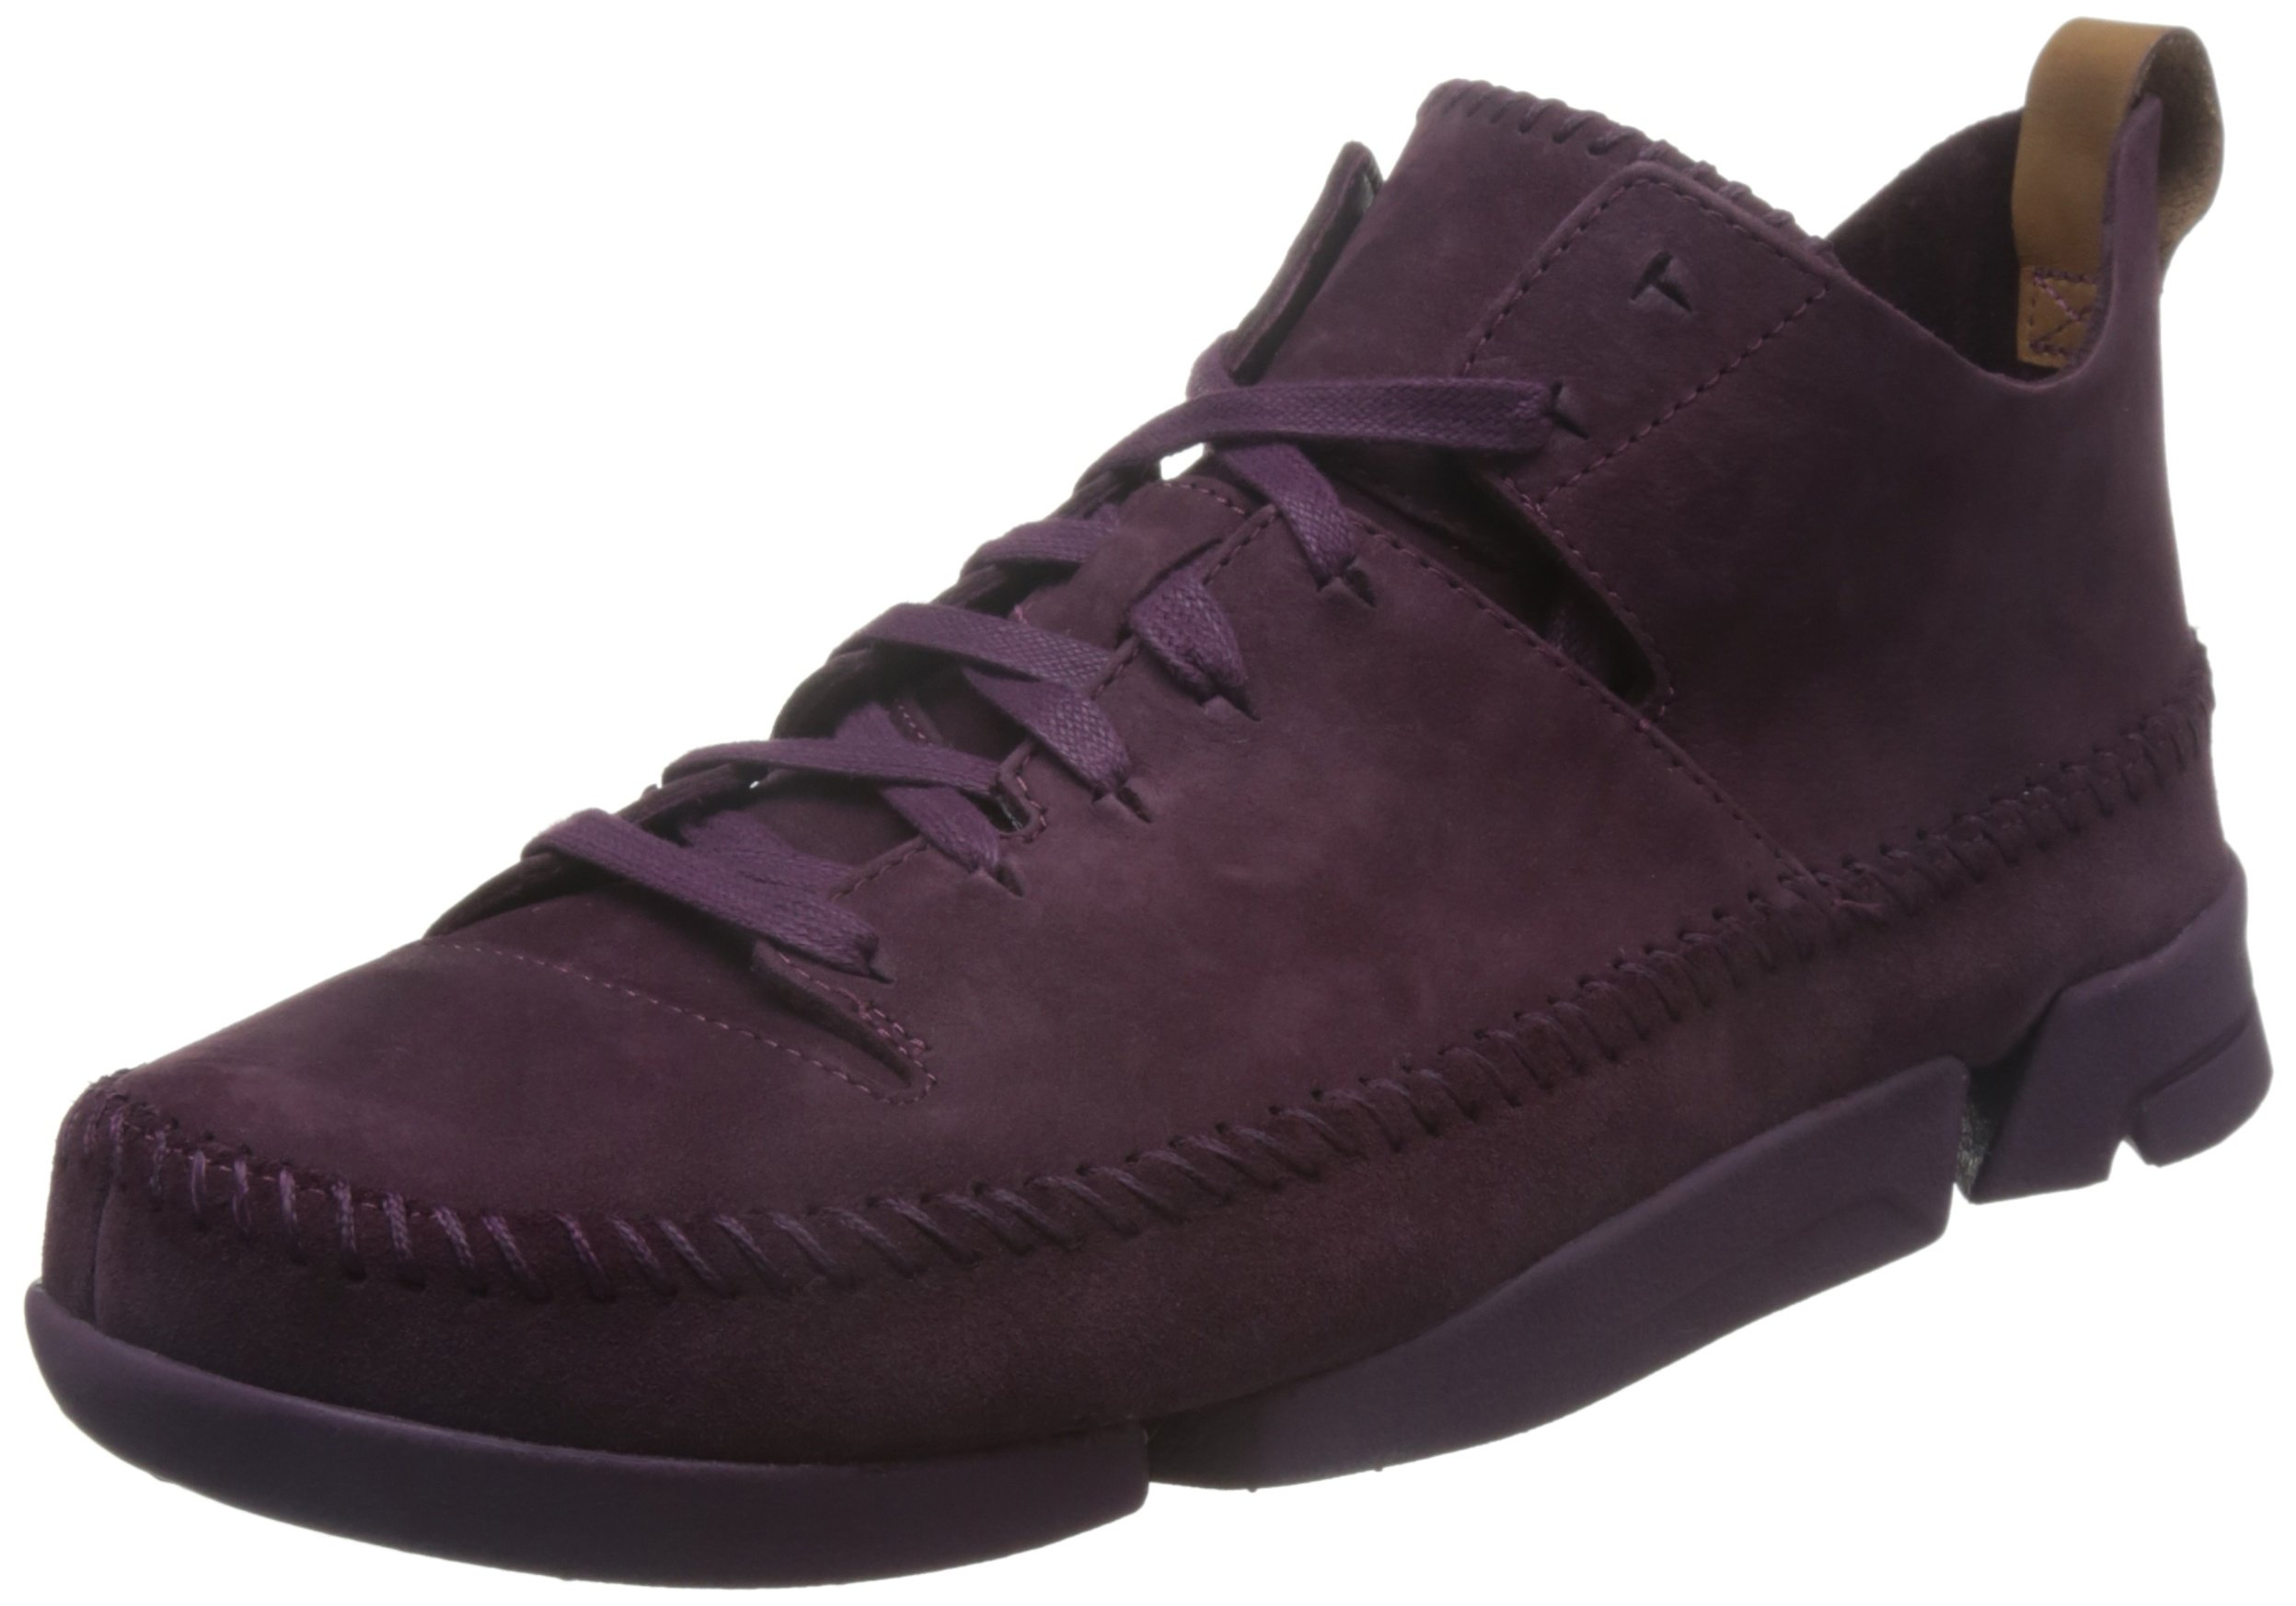 HommeVioletpurple Clarks Grape Nub45 Originals Trigenic FlexSneakers Eu Basses 6gymY7vfIb